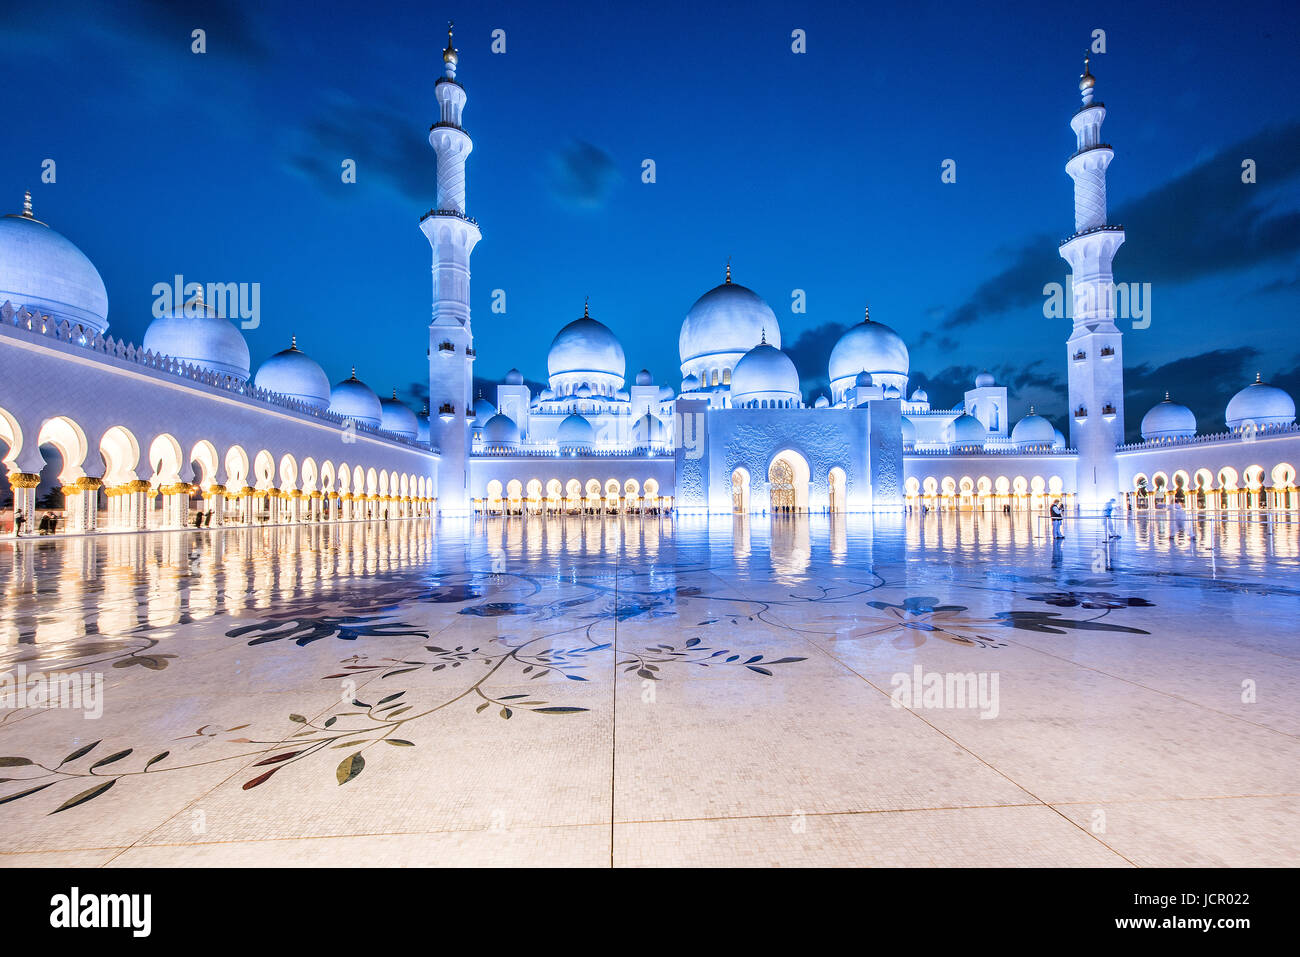 Abu Dhabi Grand Mosque - Stock Image